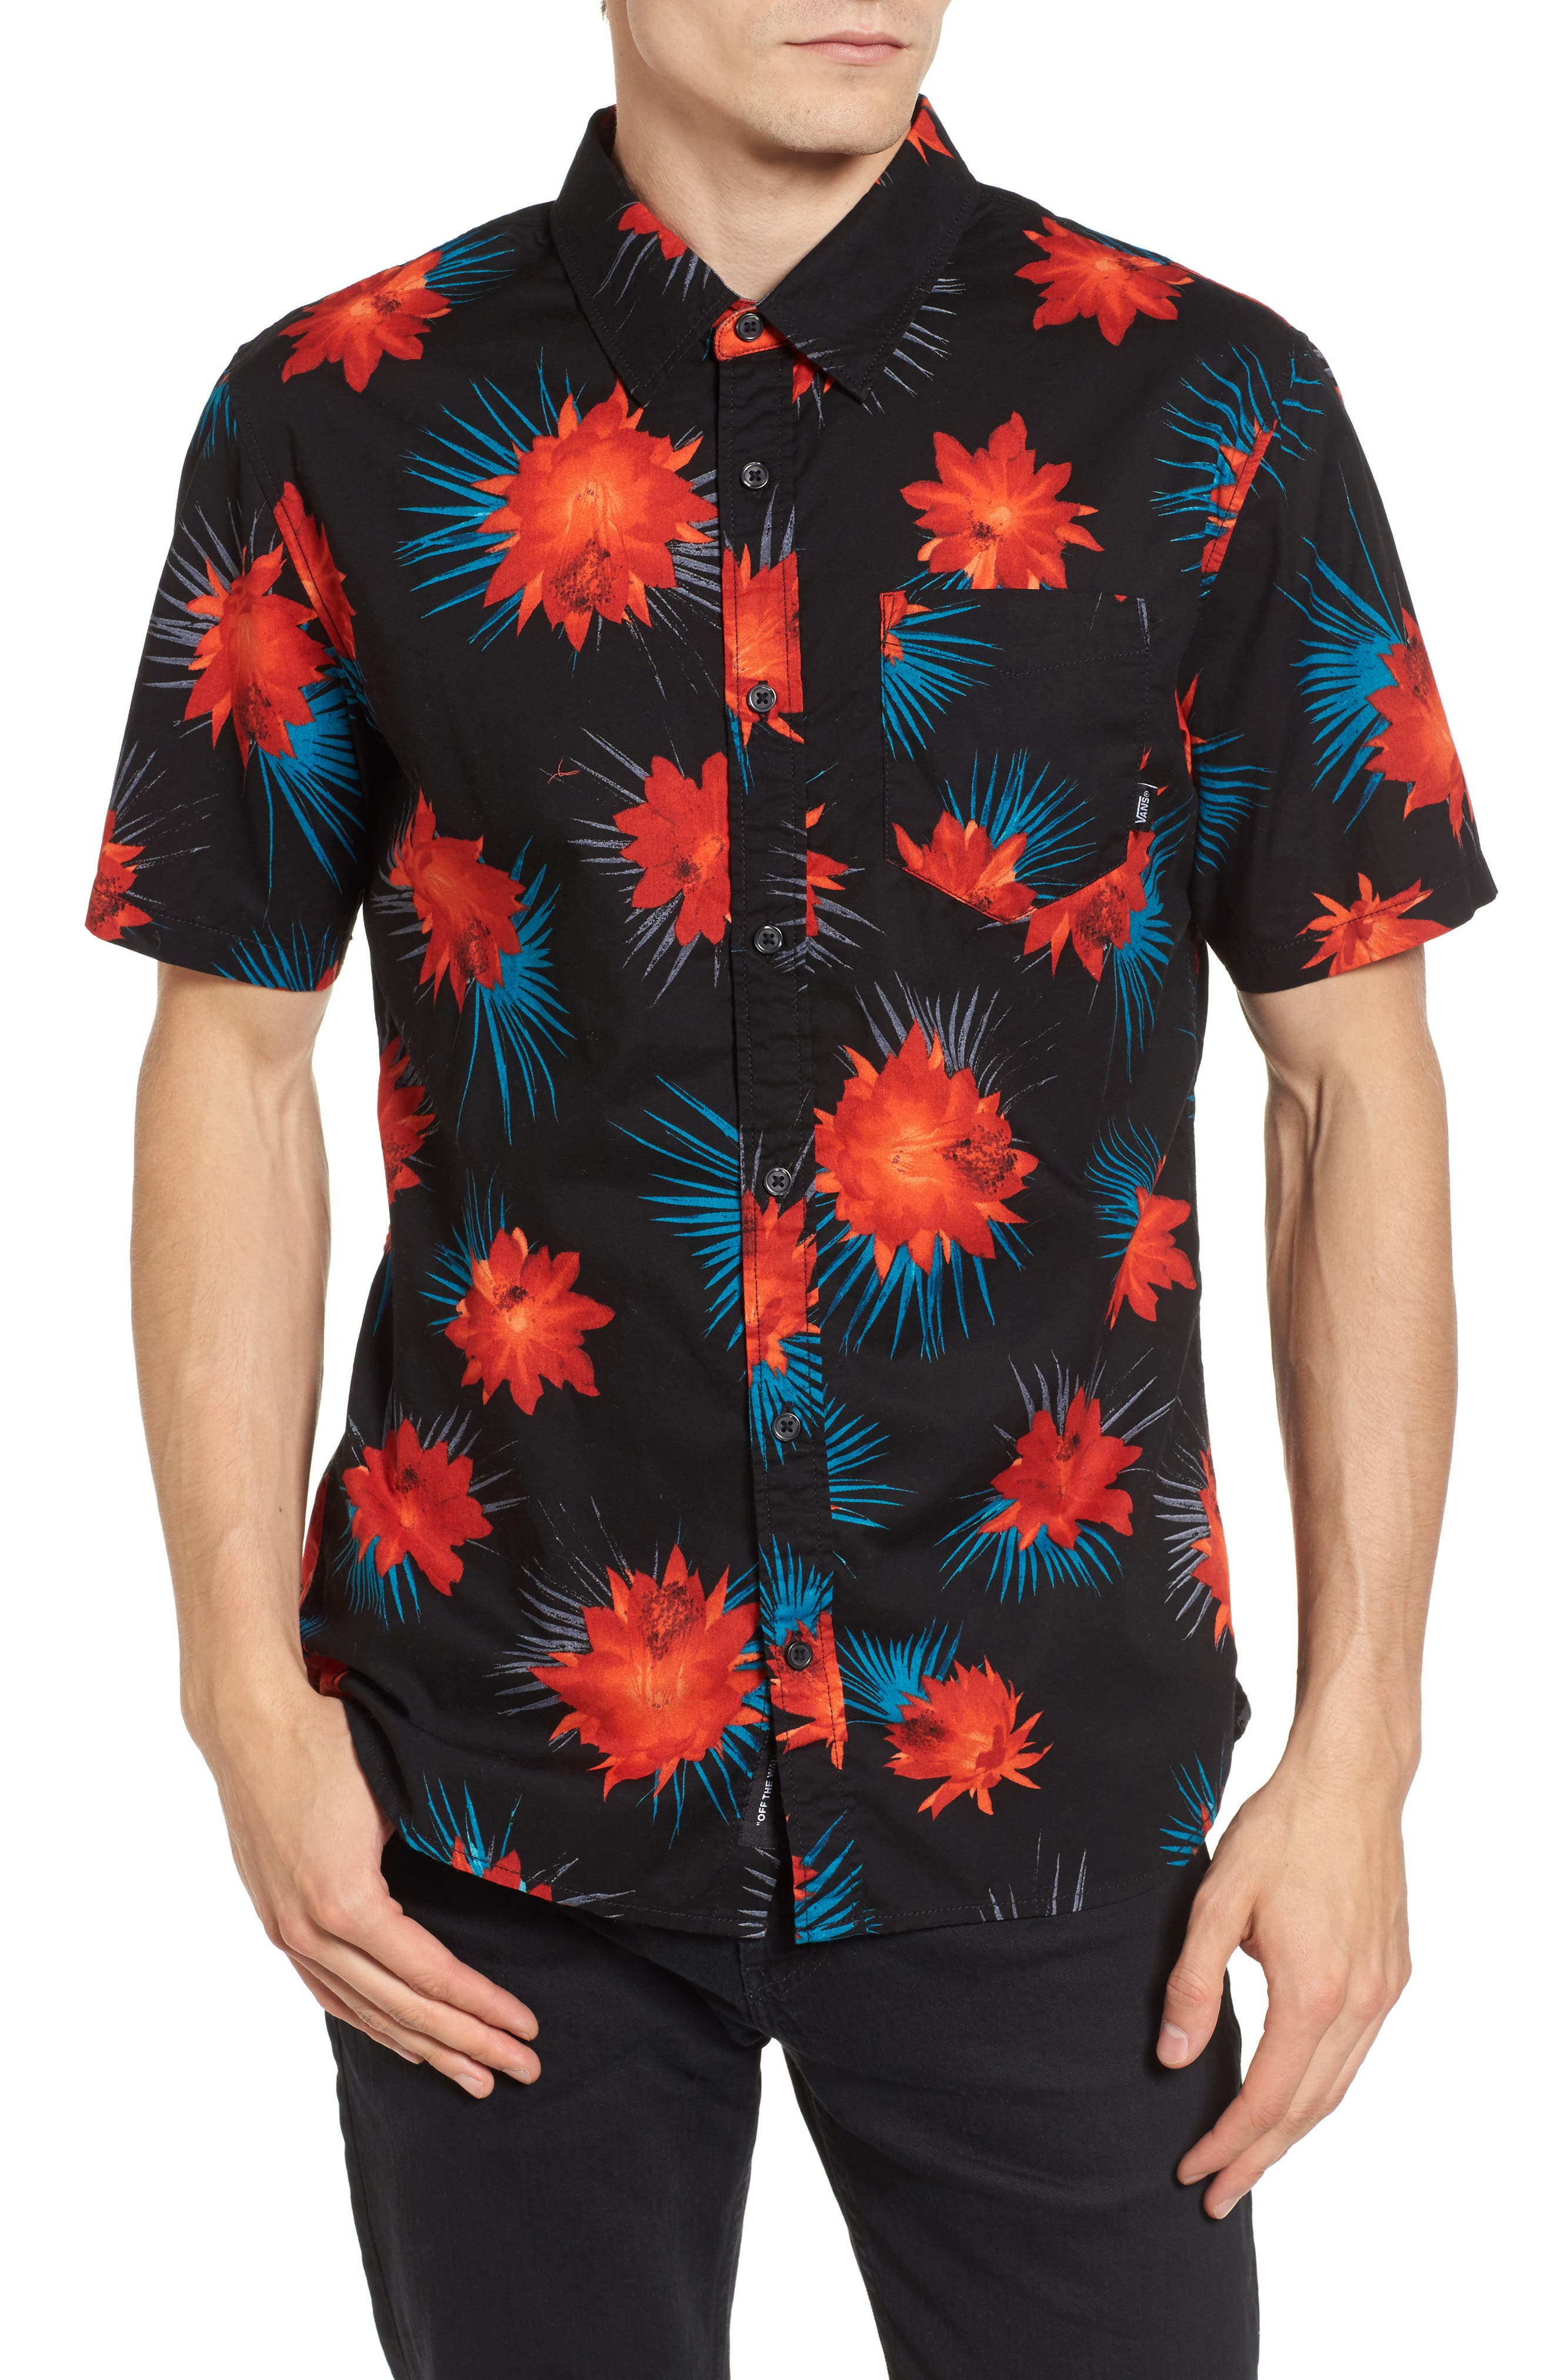 Cultivar Woven Shirt,                             Main thumbnail 1, color,                             001